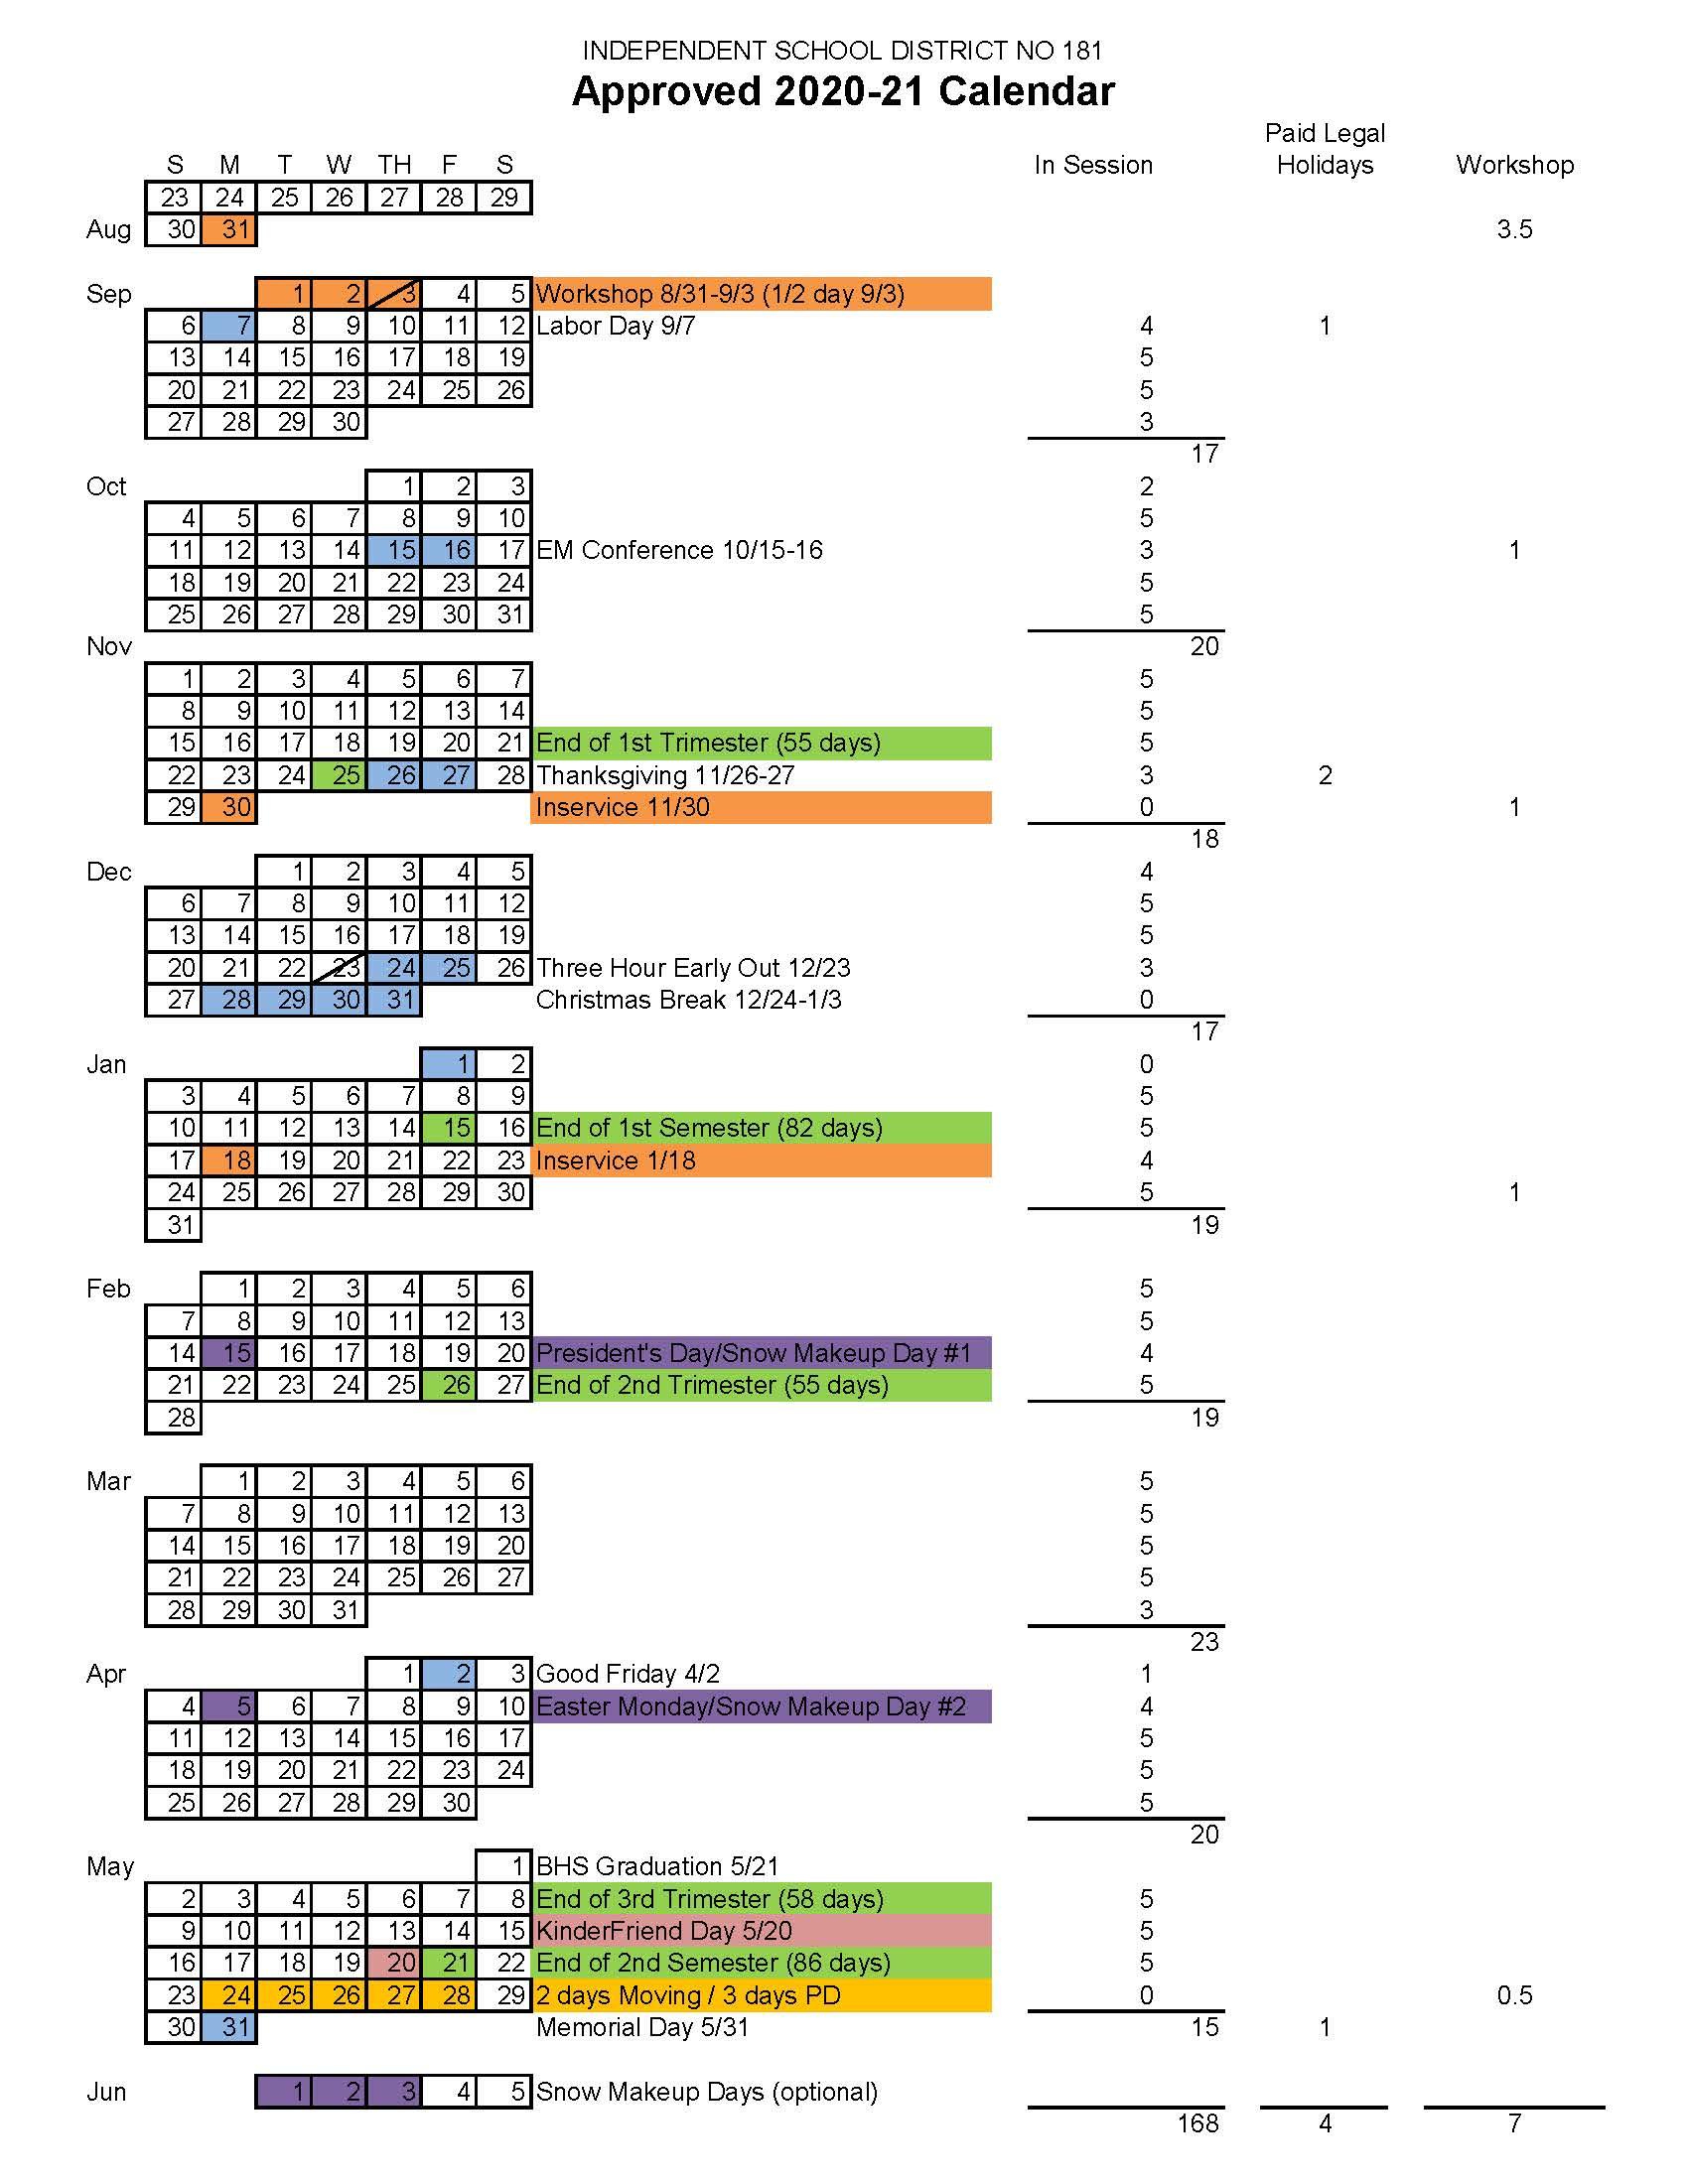 Approved 2020 21 Calendar - Brainerd Public Schools For Harrison School District 2 Calendar 2021